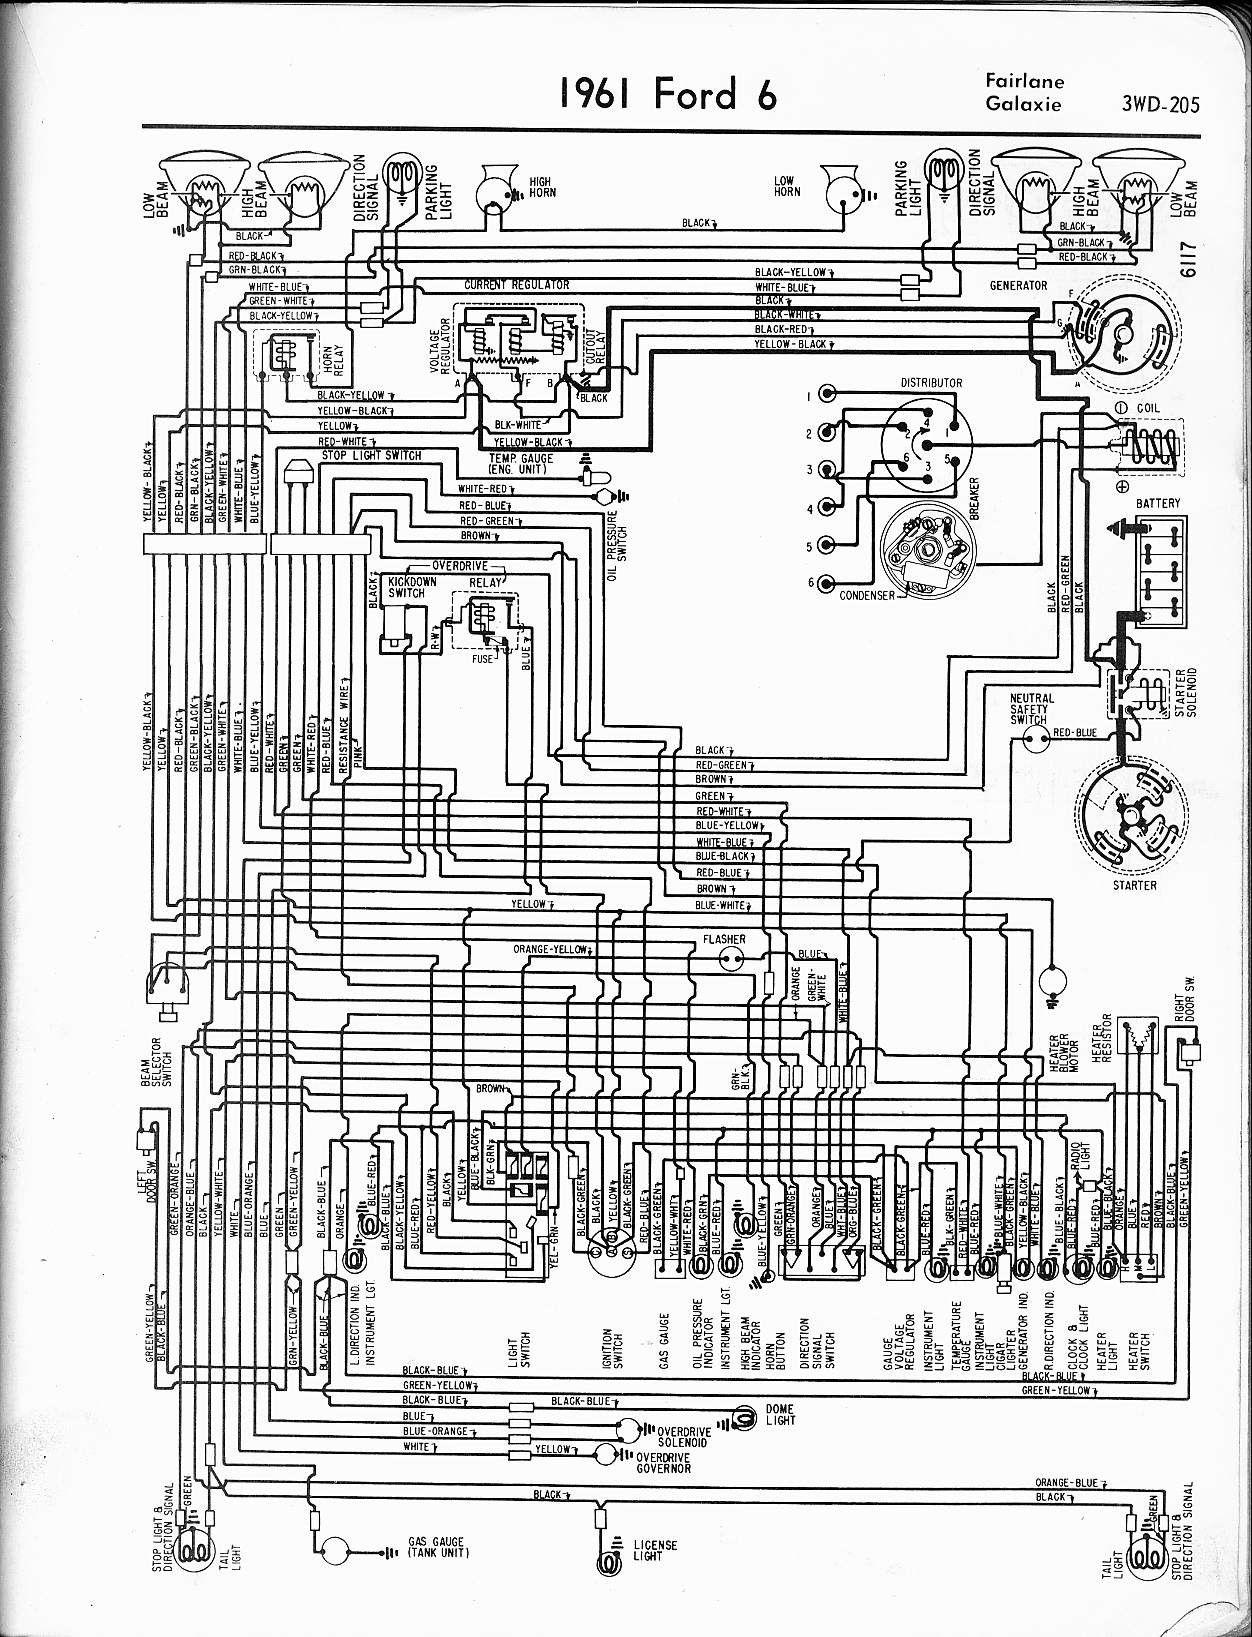 Mercury Mark 55e Wiring Diagram In 2021 Ignition Switch Wiring Diagram Wiring Diagram 1974 Ford F100